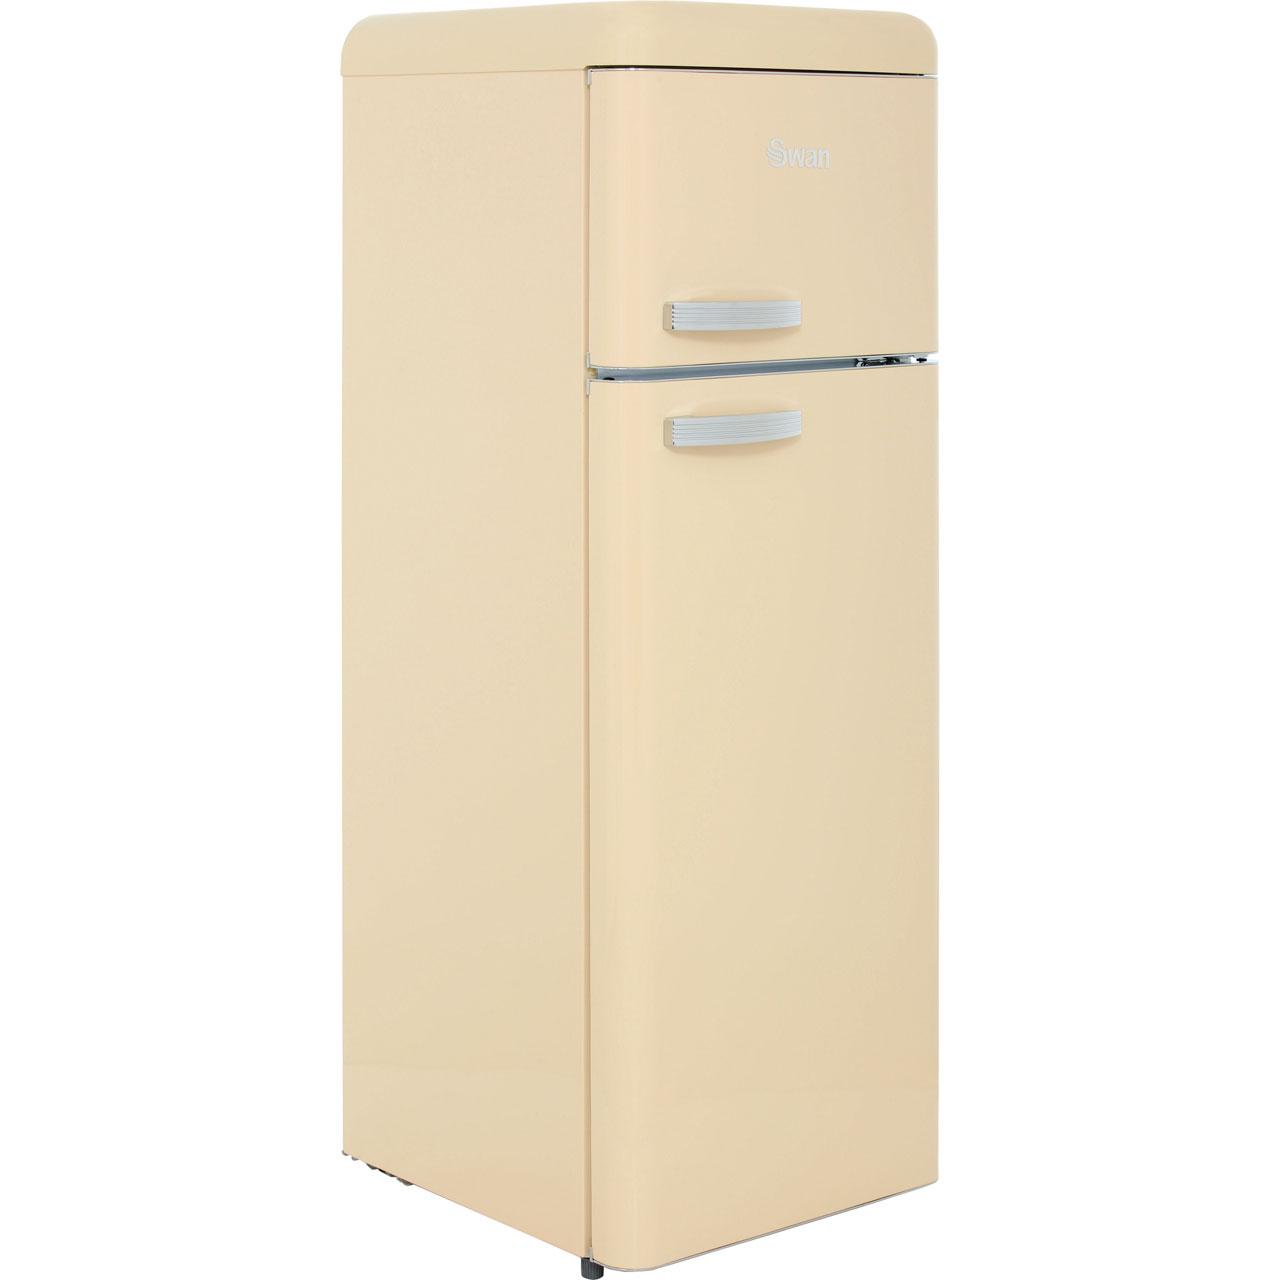 Swan Retro SR11010CN Free Standing Fridge Freezer in Cream